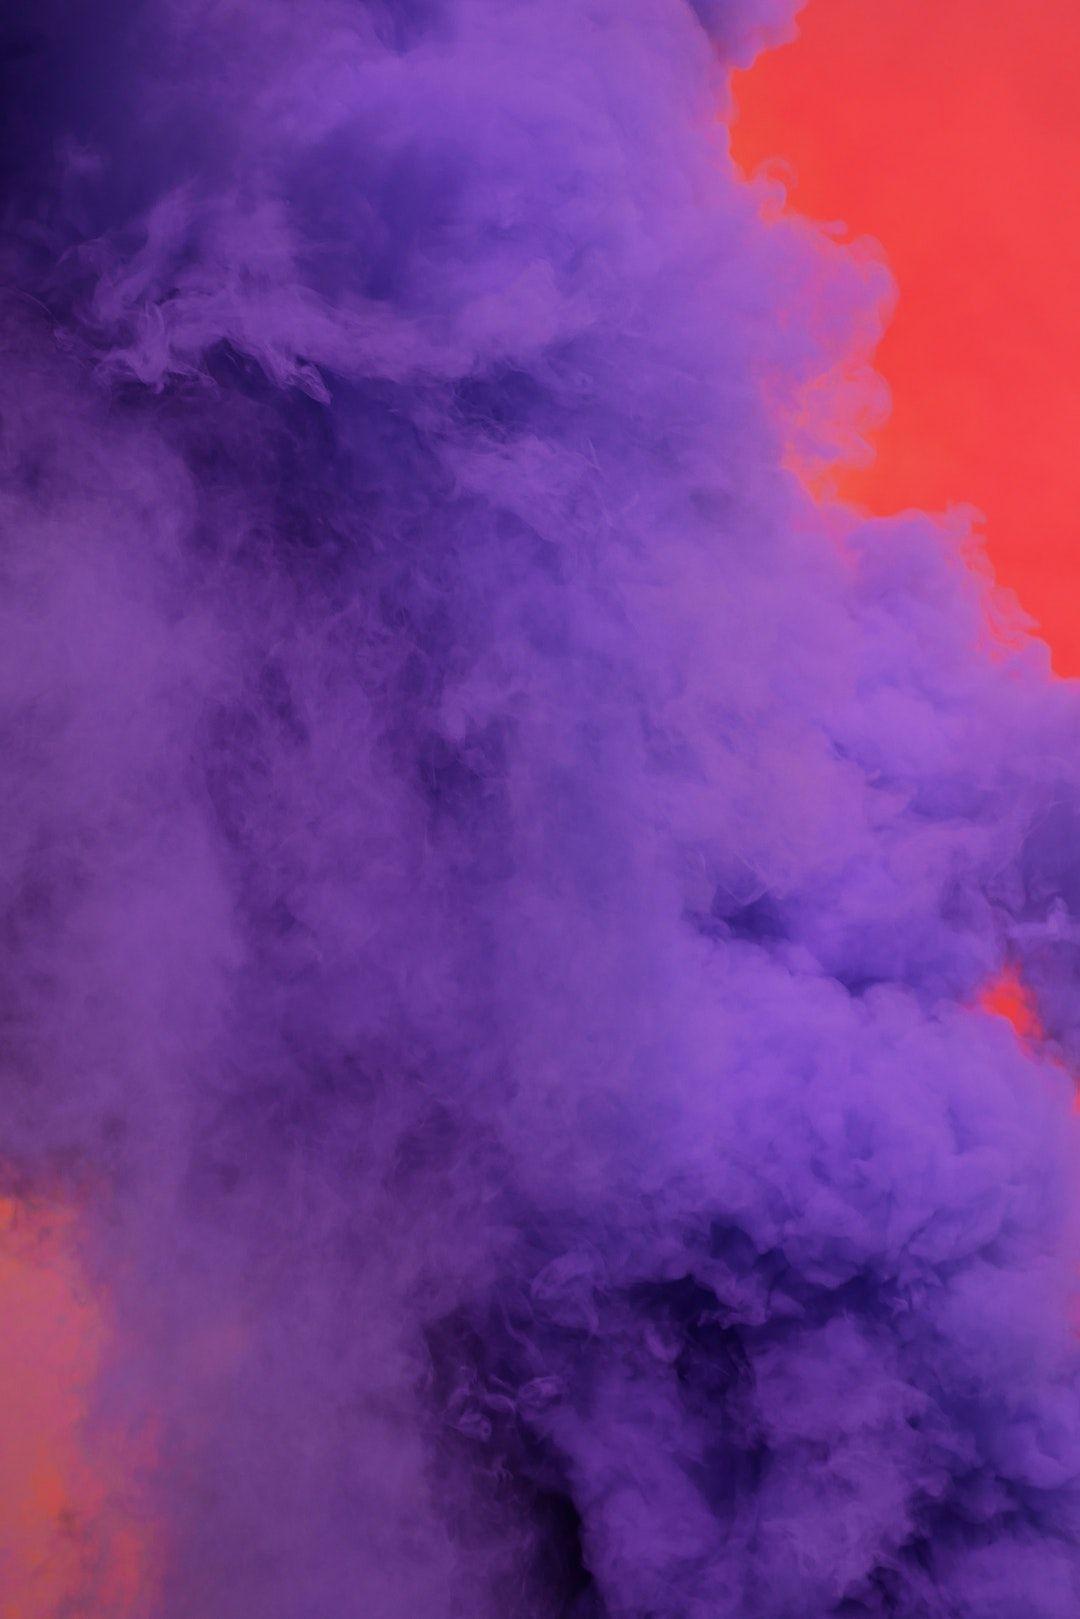 Download this free HD photo of smoke, smoke grenade, smoke